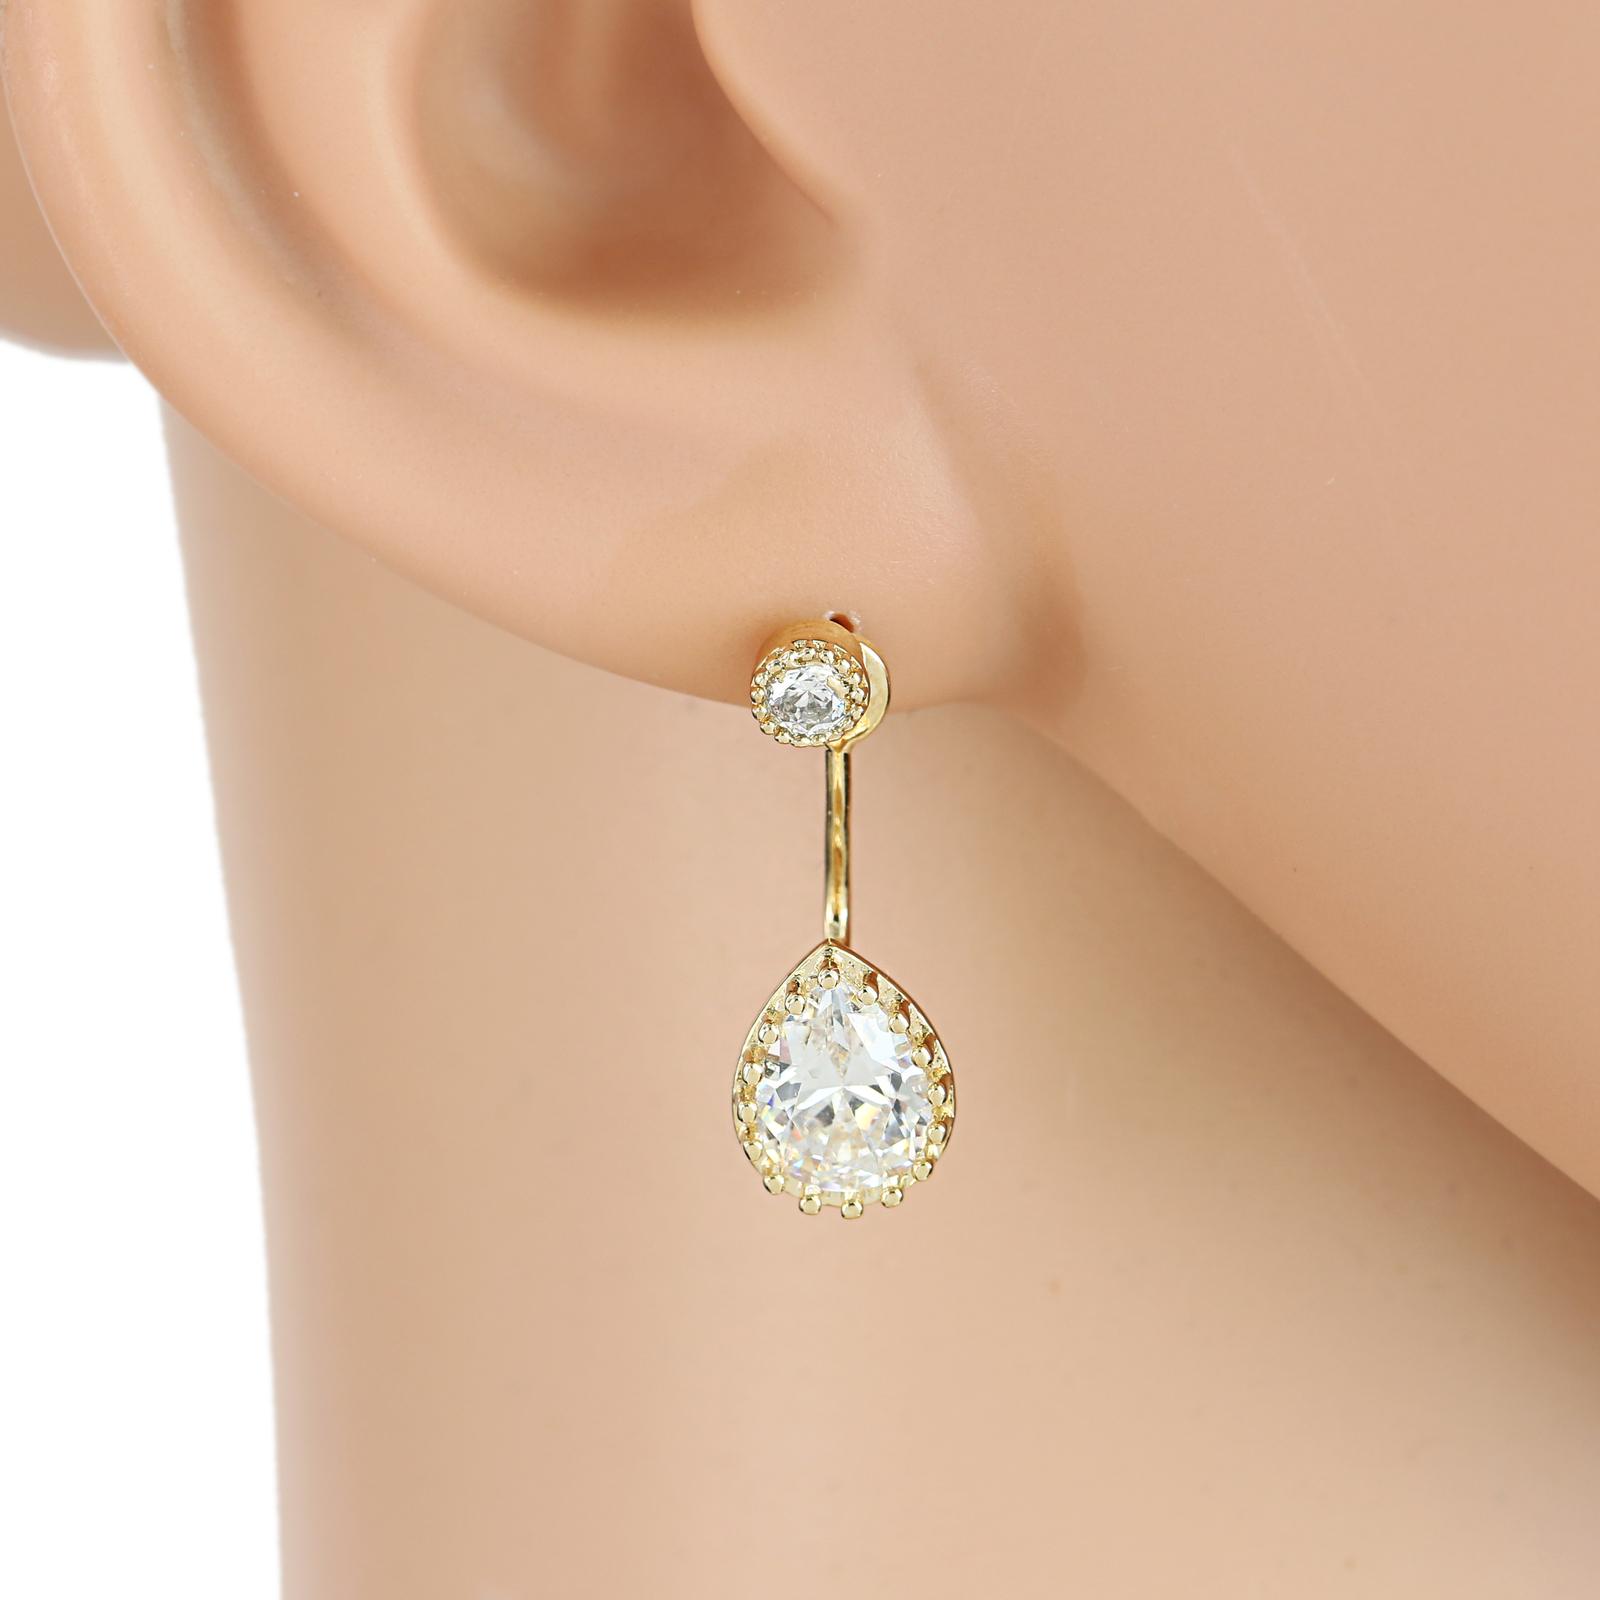 UE-Striking Gold Tone Drop Earrings With Dazzling Faux Pear Shape White Sapphire - $18.99